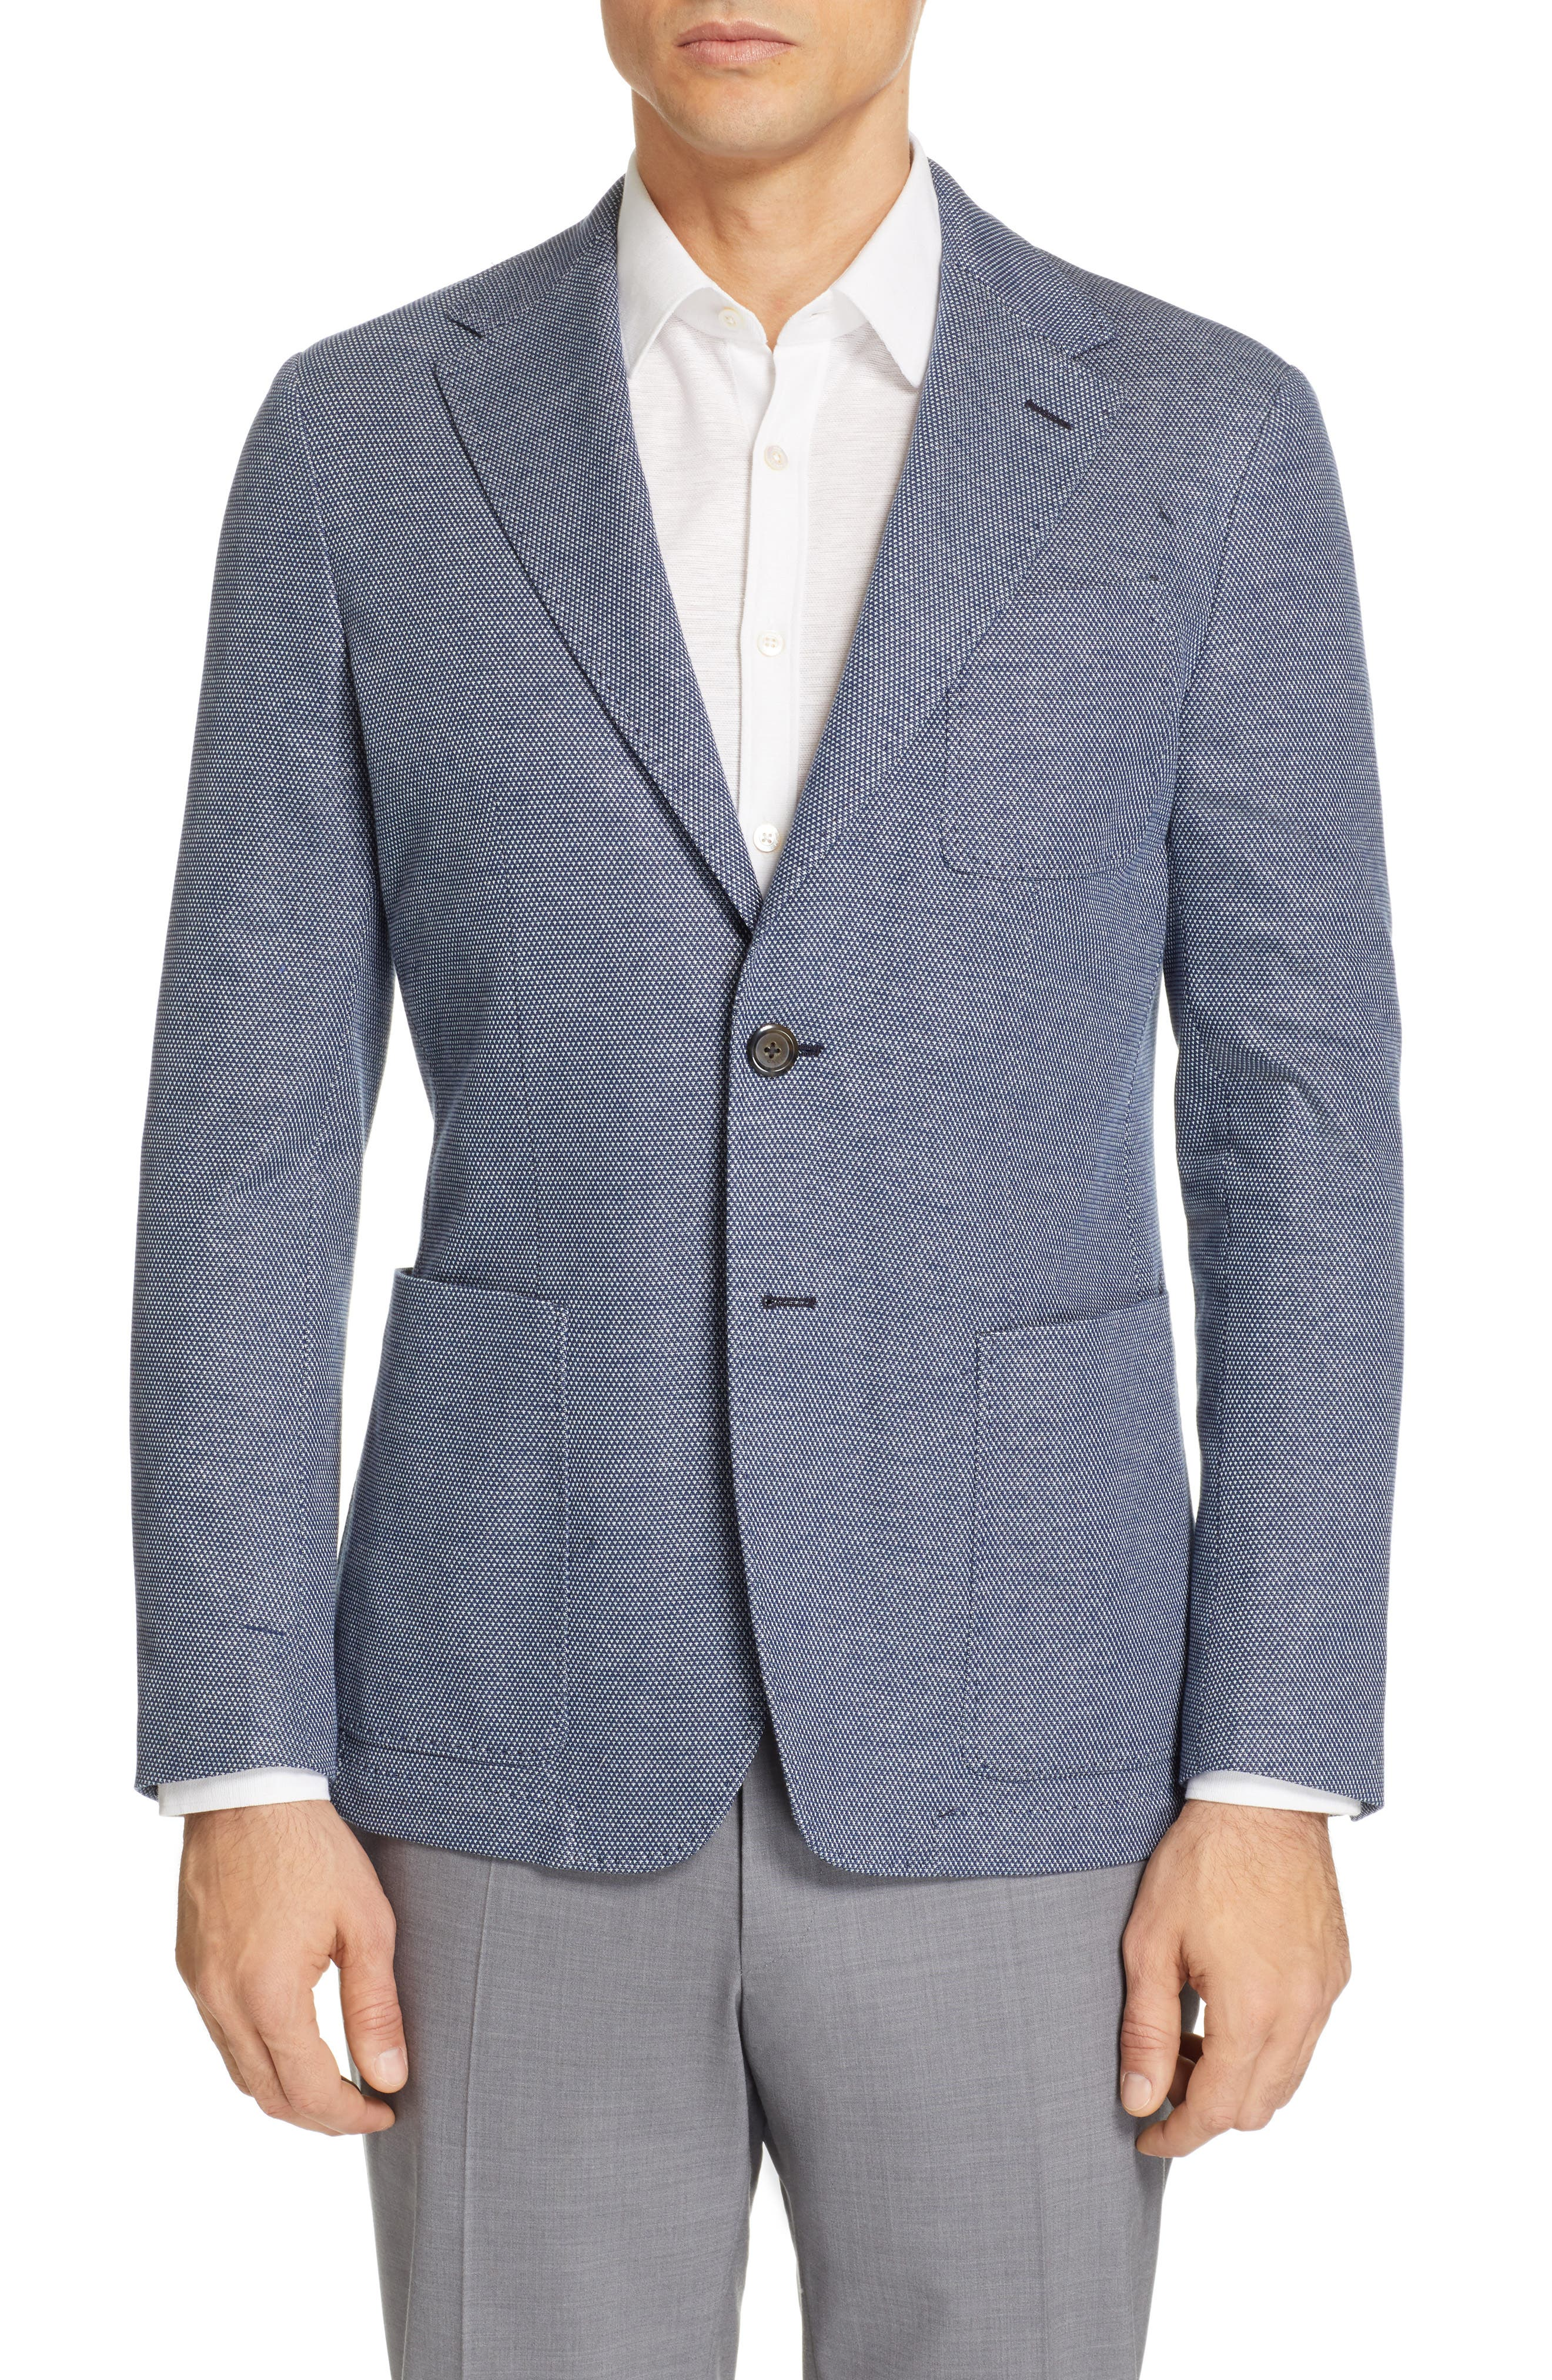 CANALI, Classic Fit Cotton Blend Sport Coat, Main thumbnail 1, color, NAVY